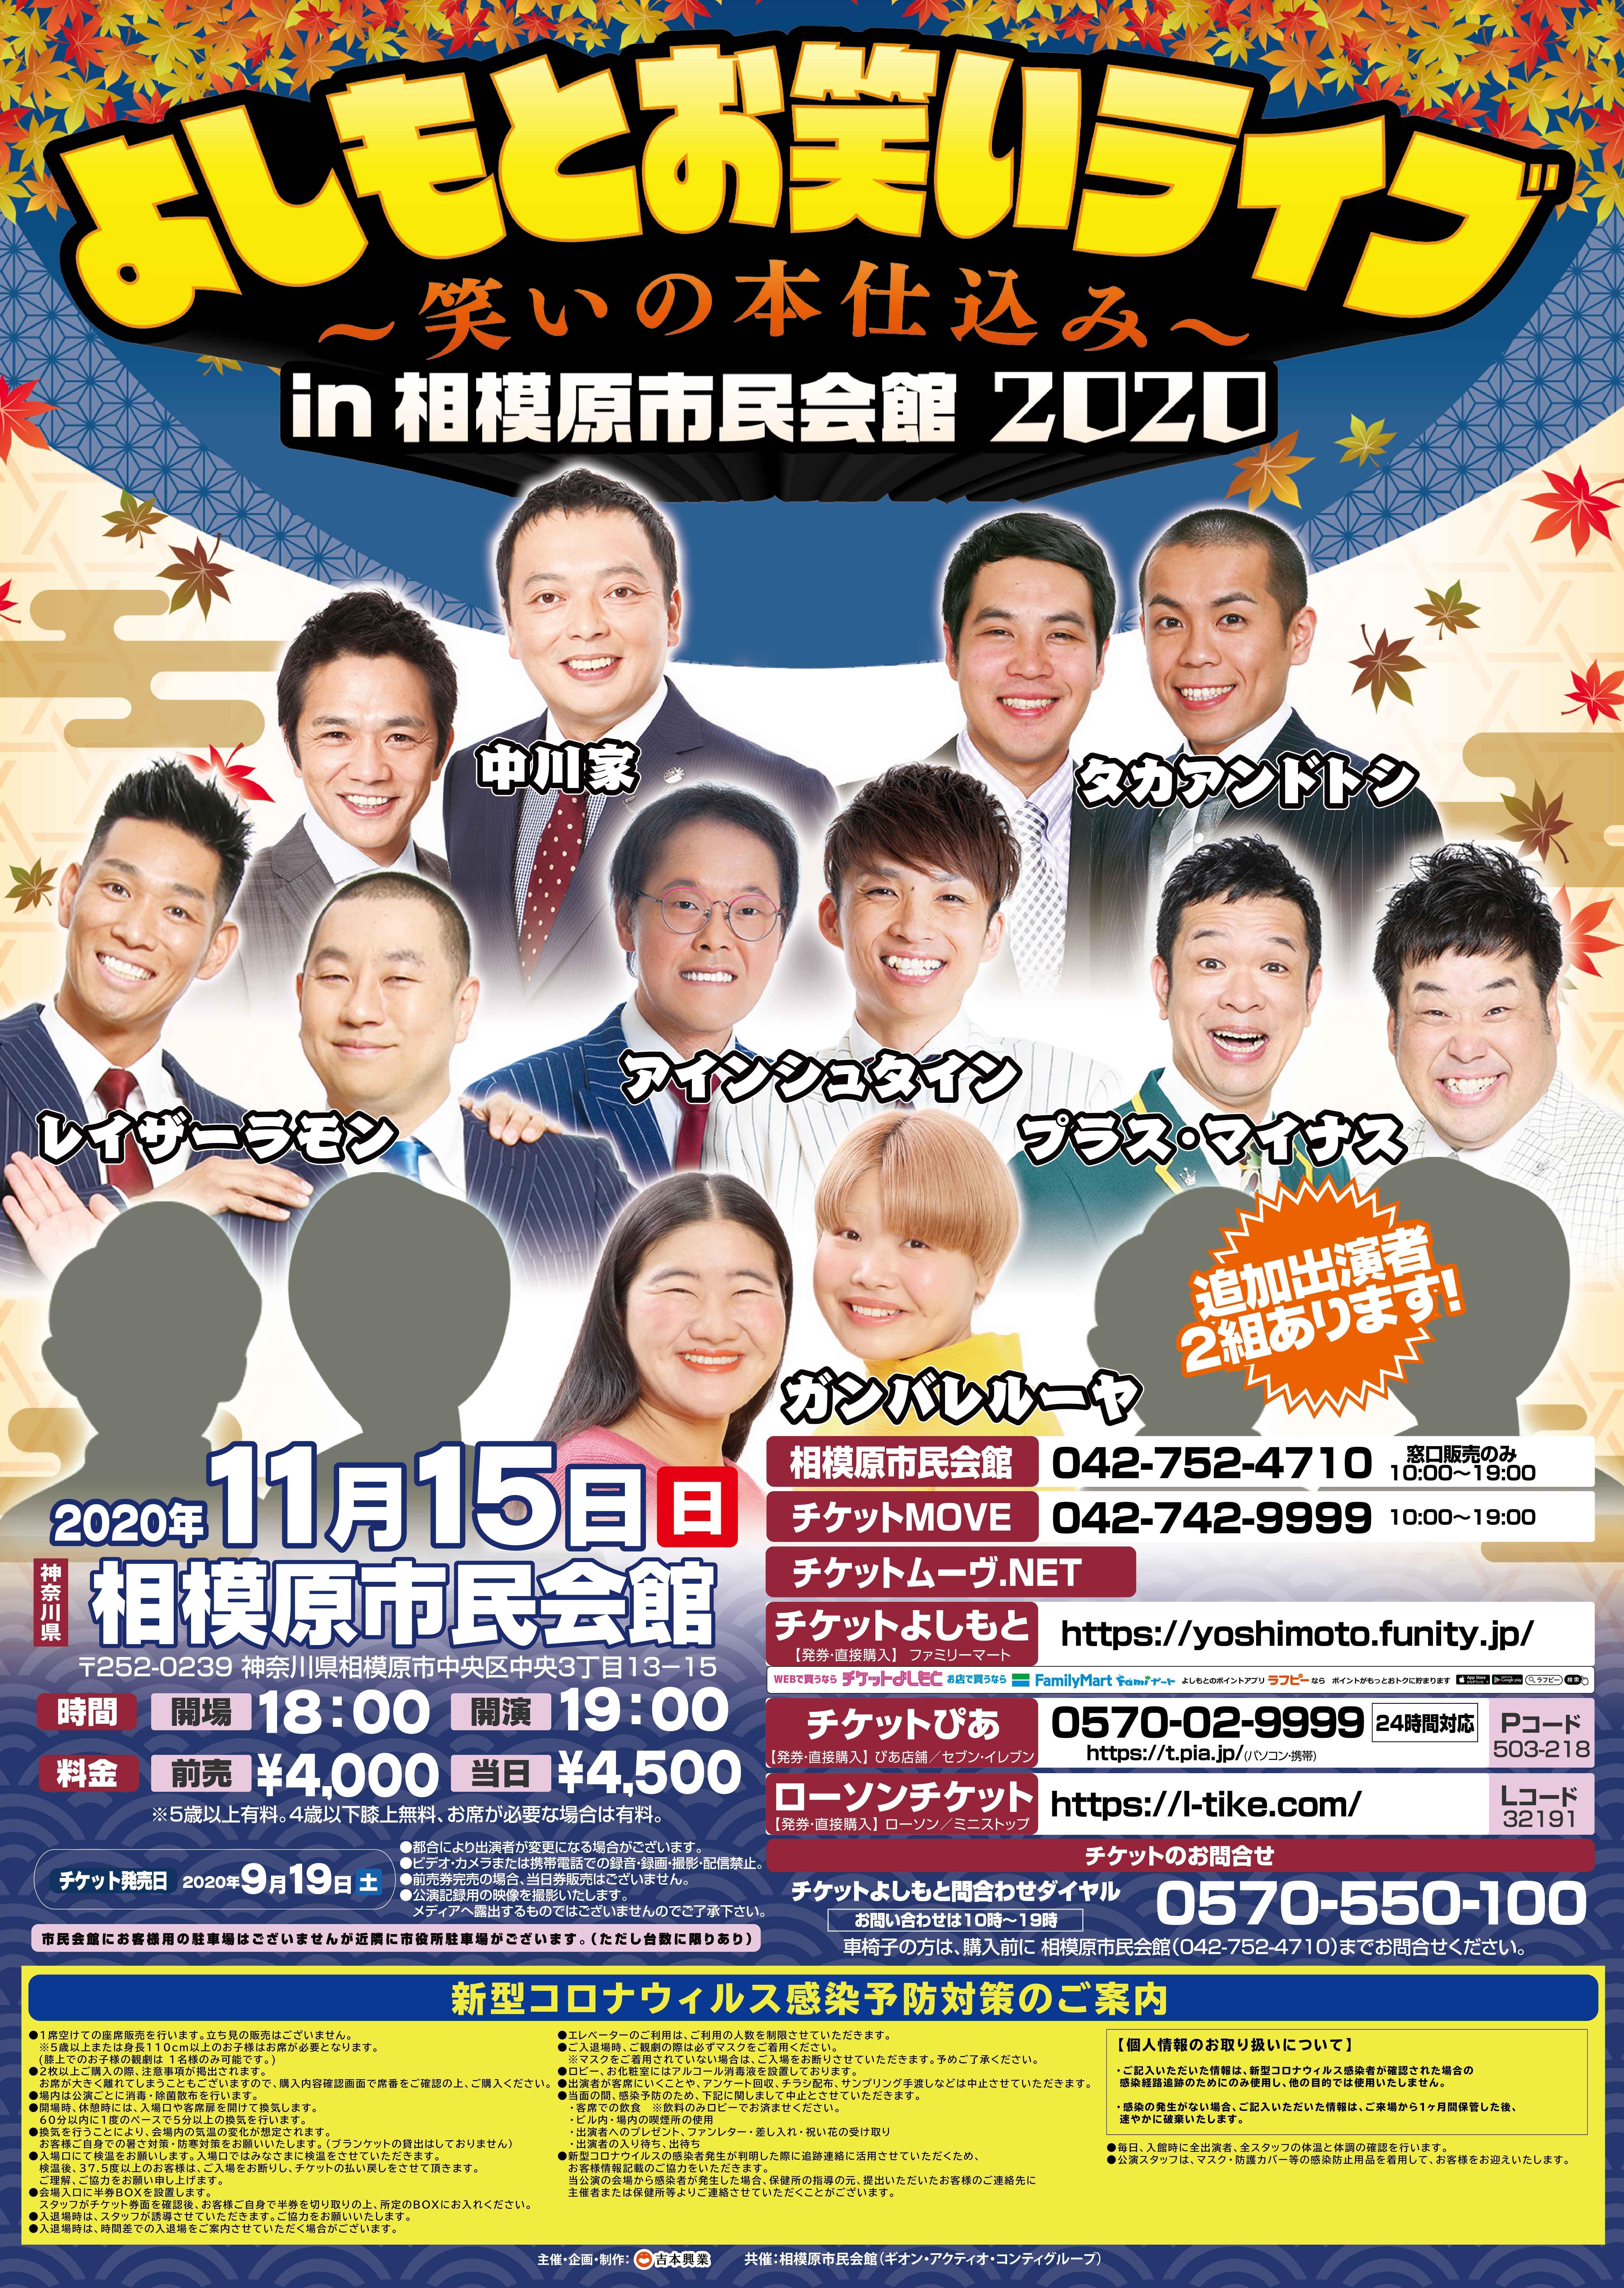 http://www.syumatsu.jp/20200915104625-7725711fe80b1621c4d7e8b106526bbecb55f5f4.jpg